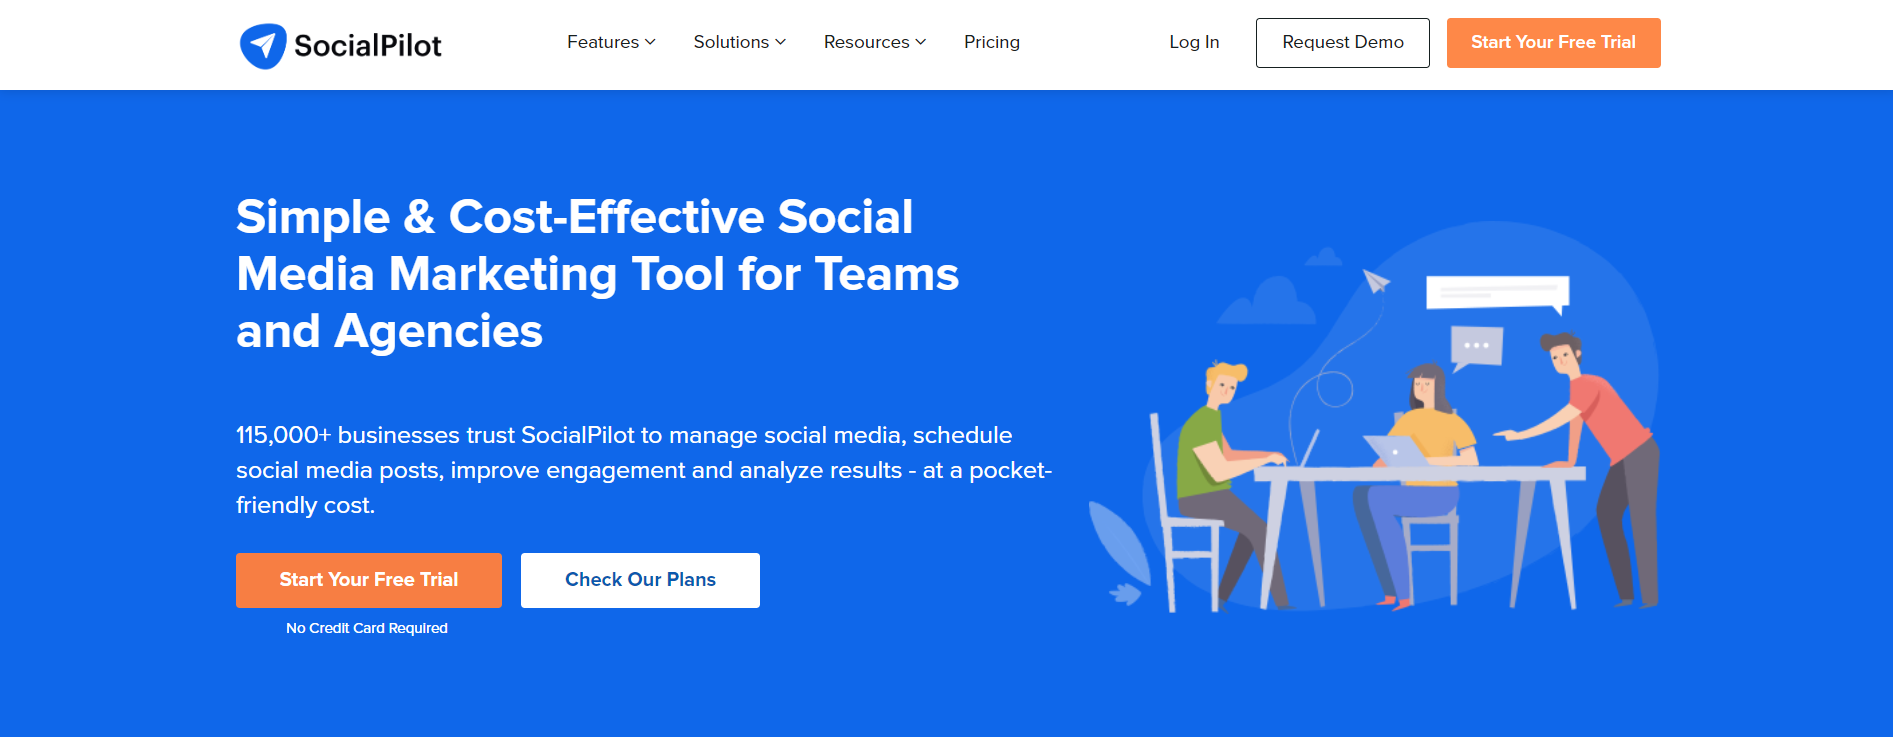 Socialpilot-website-image